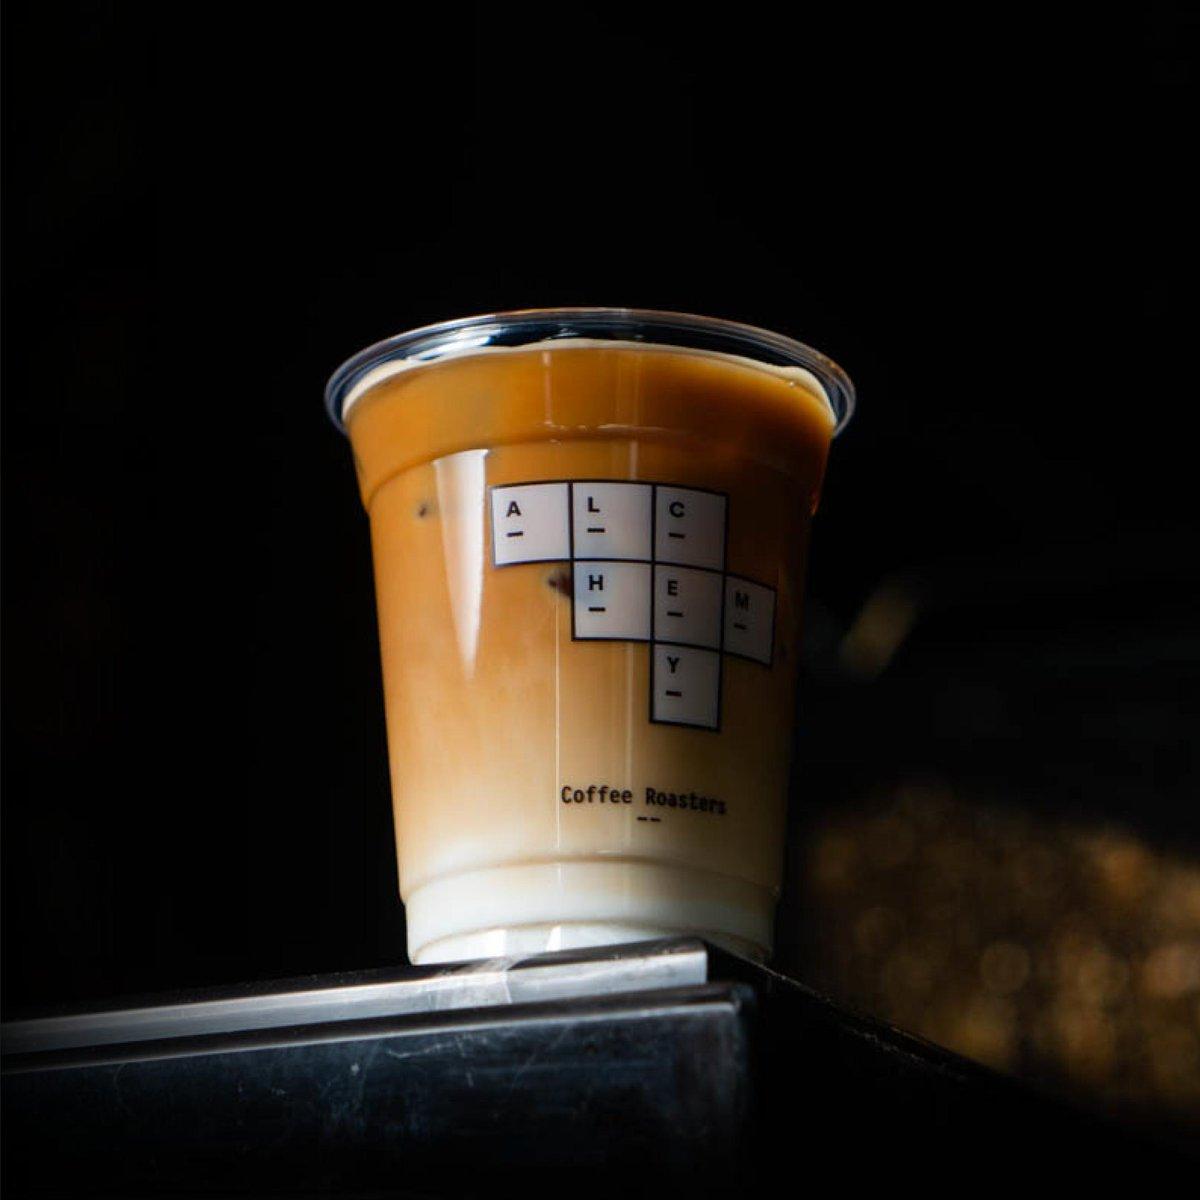 Coffee is a language in itself!   #Alchemy #Alchemyksa #Coffee #RamadanKareem https://t.co/mOtYOuLeQo